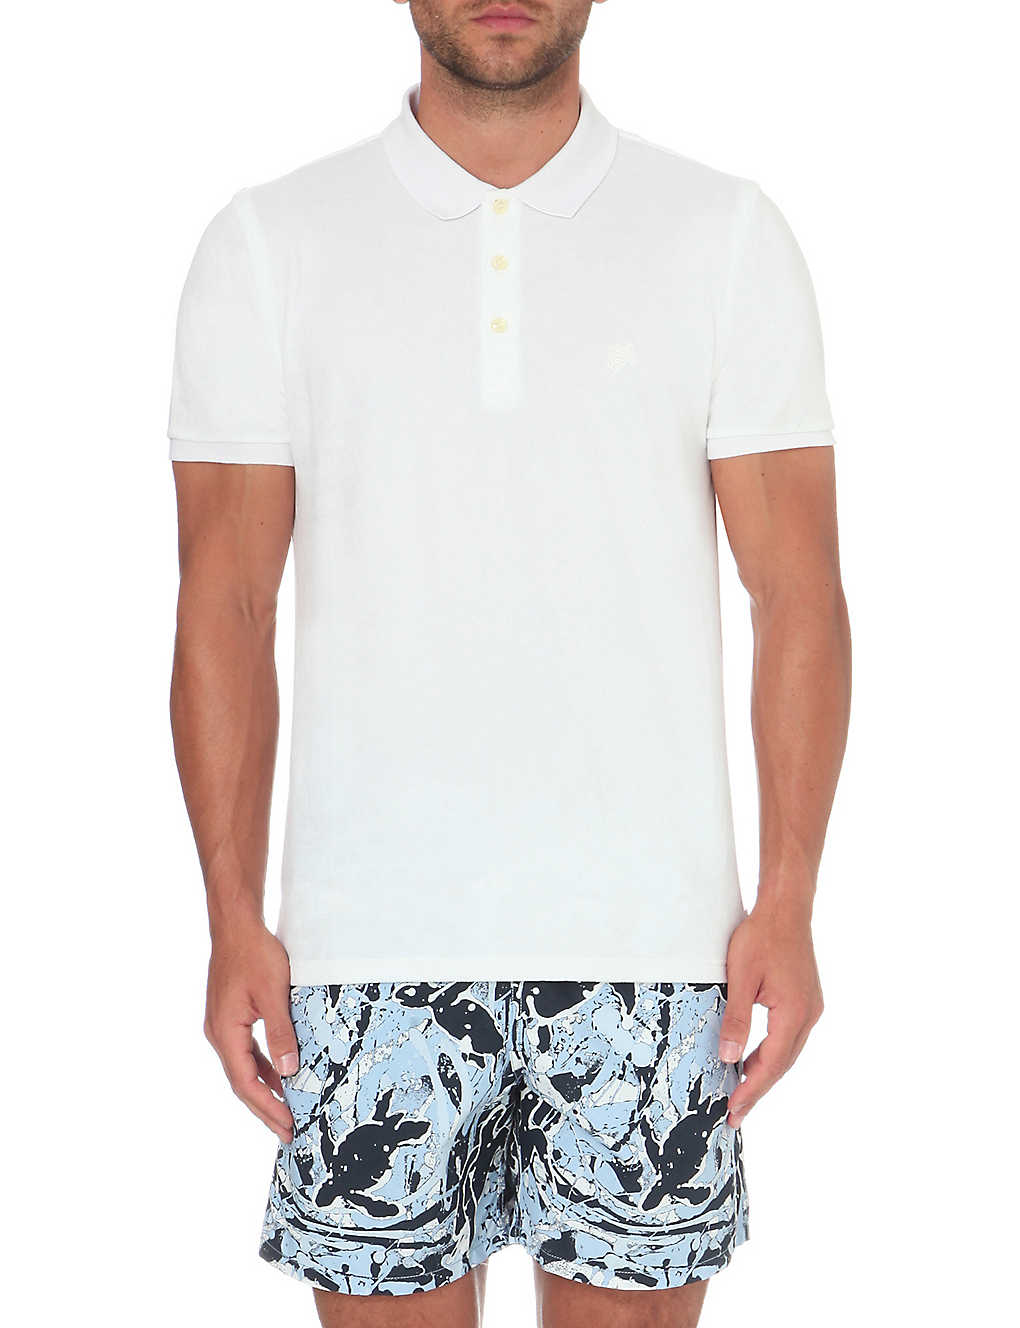 a766784988 VILEBREQUIN - Pacific cotton-towelling polo shirt | Selfridges.com